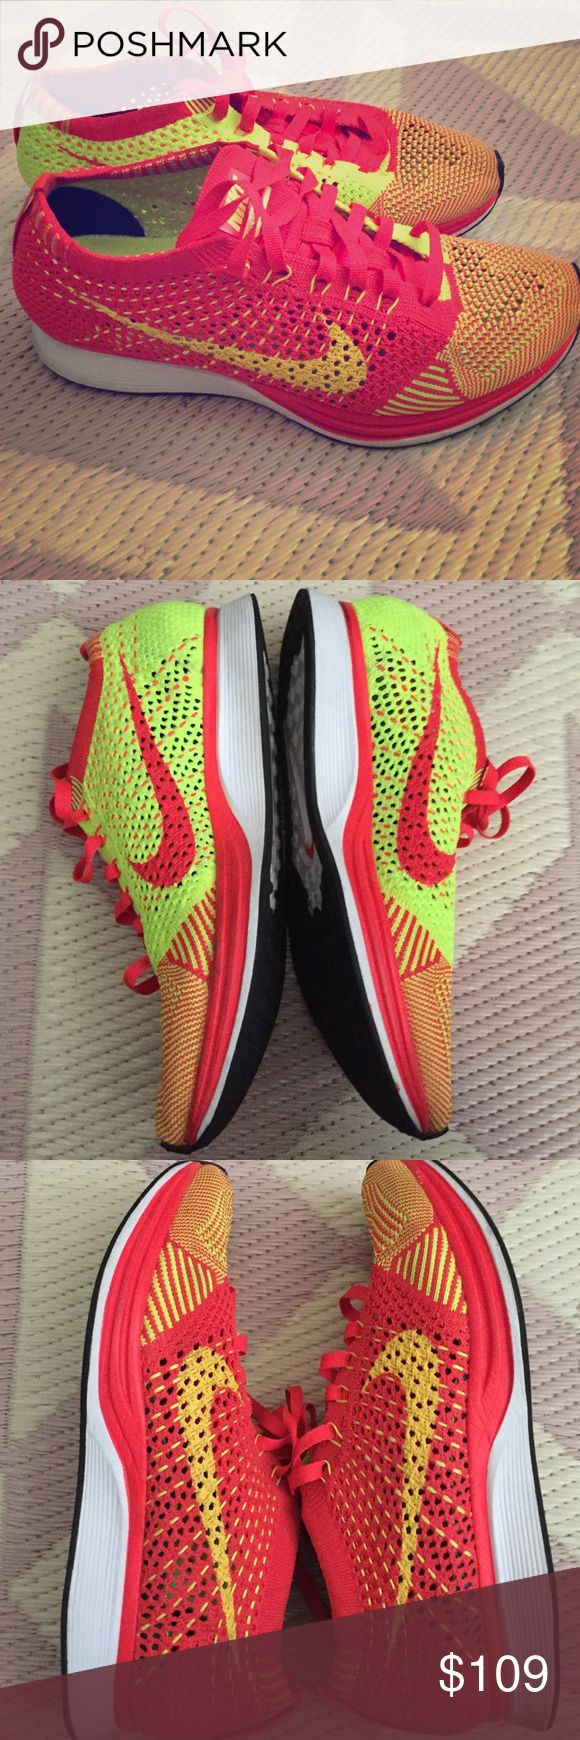 Nike Multicolor Flyknit Racers Multicolor Nike Flyknit Racers 6.5 women/5 Kids Nike Shoes Athletic Shoes